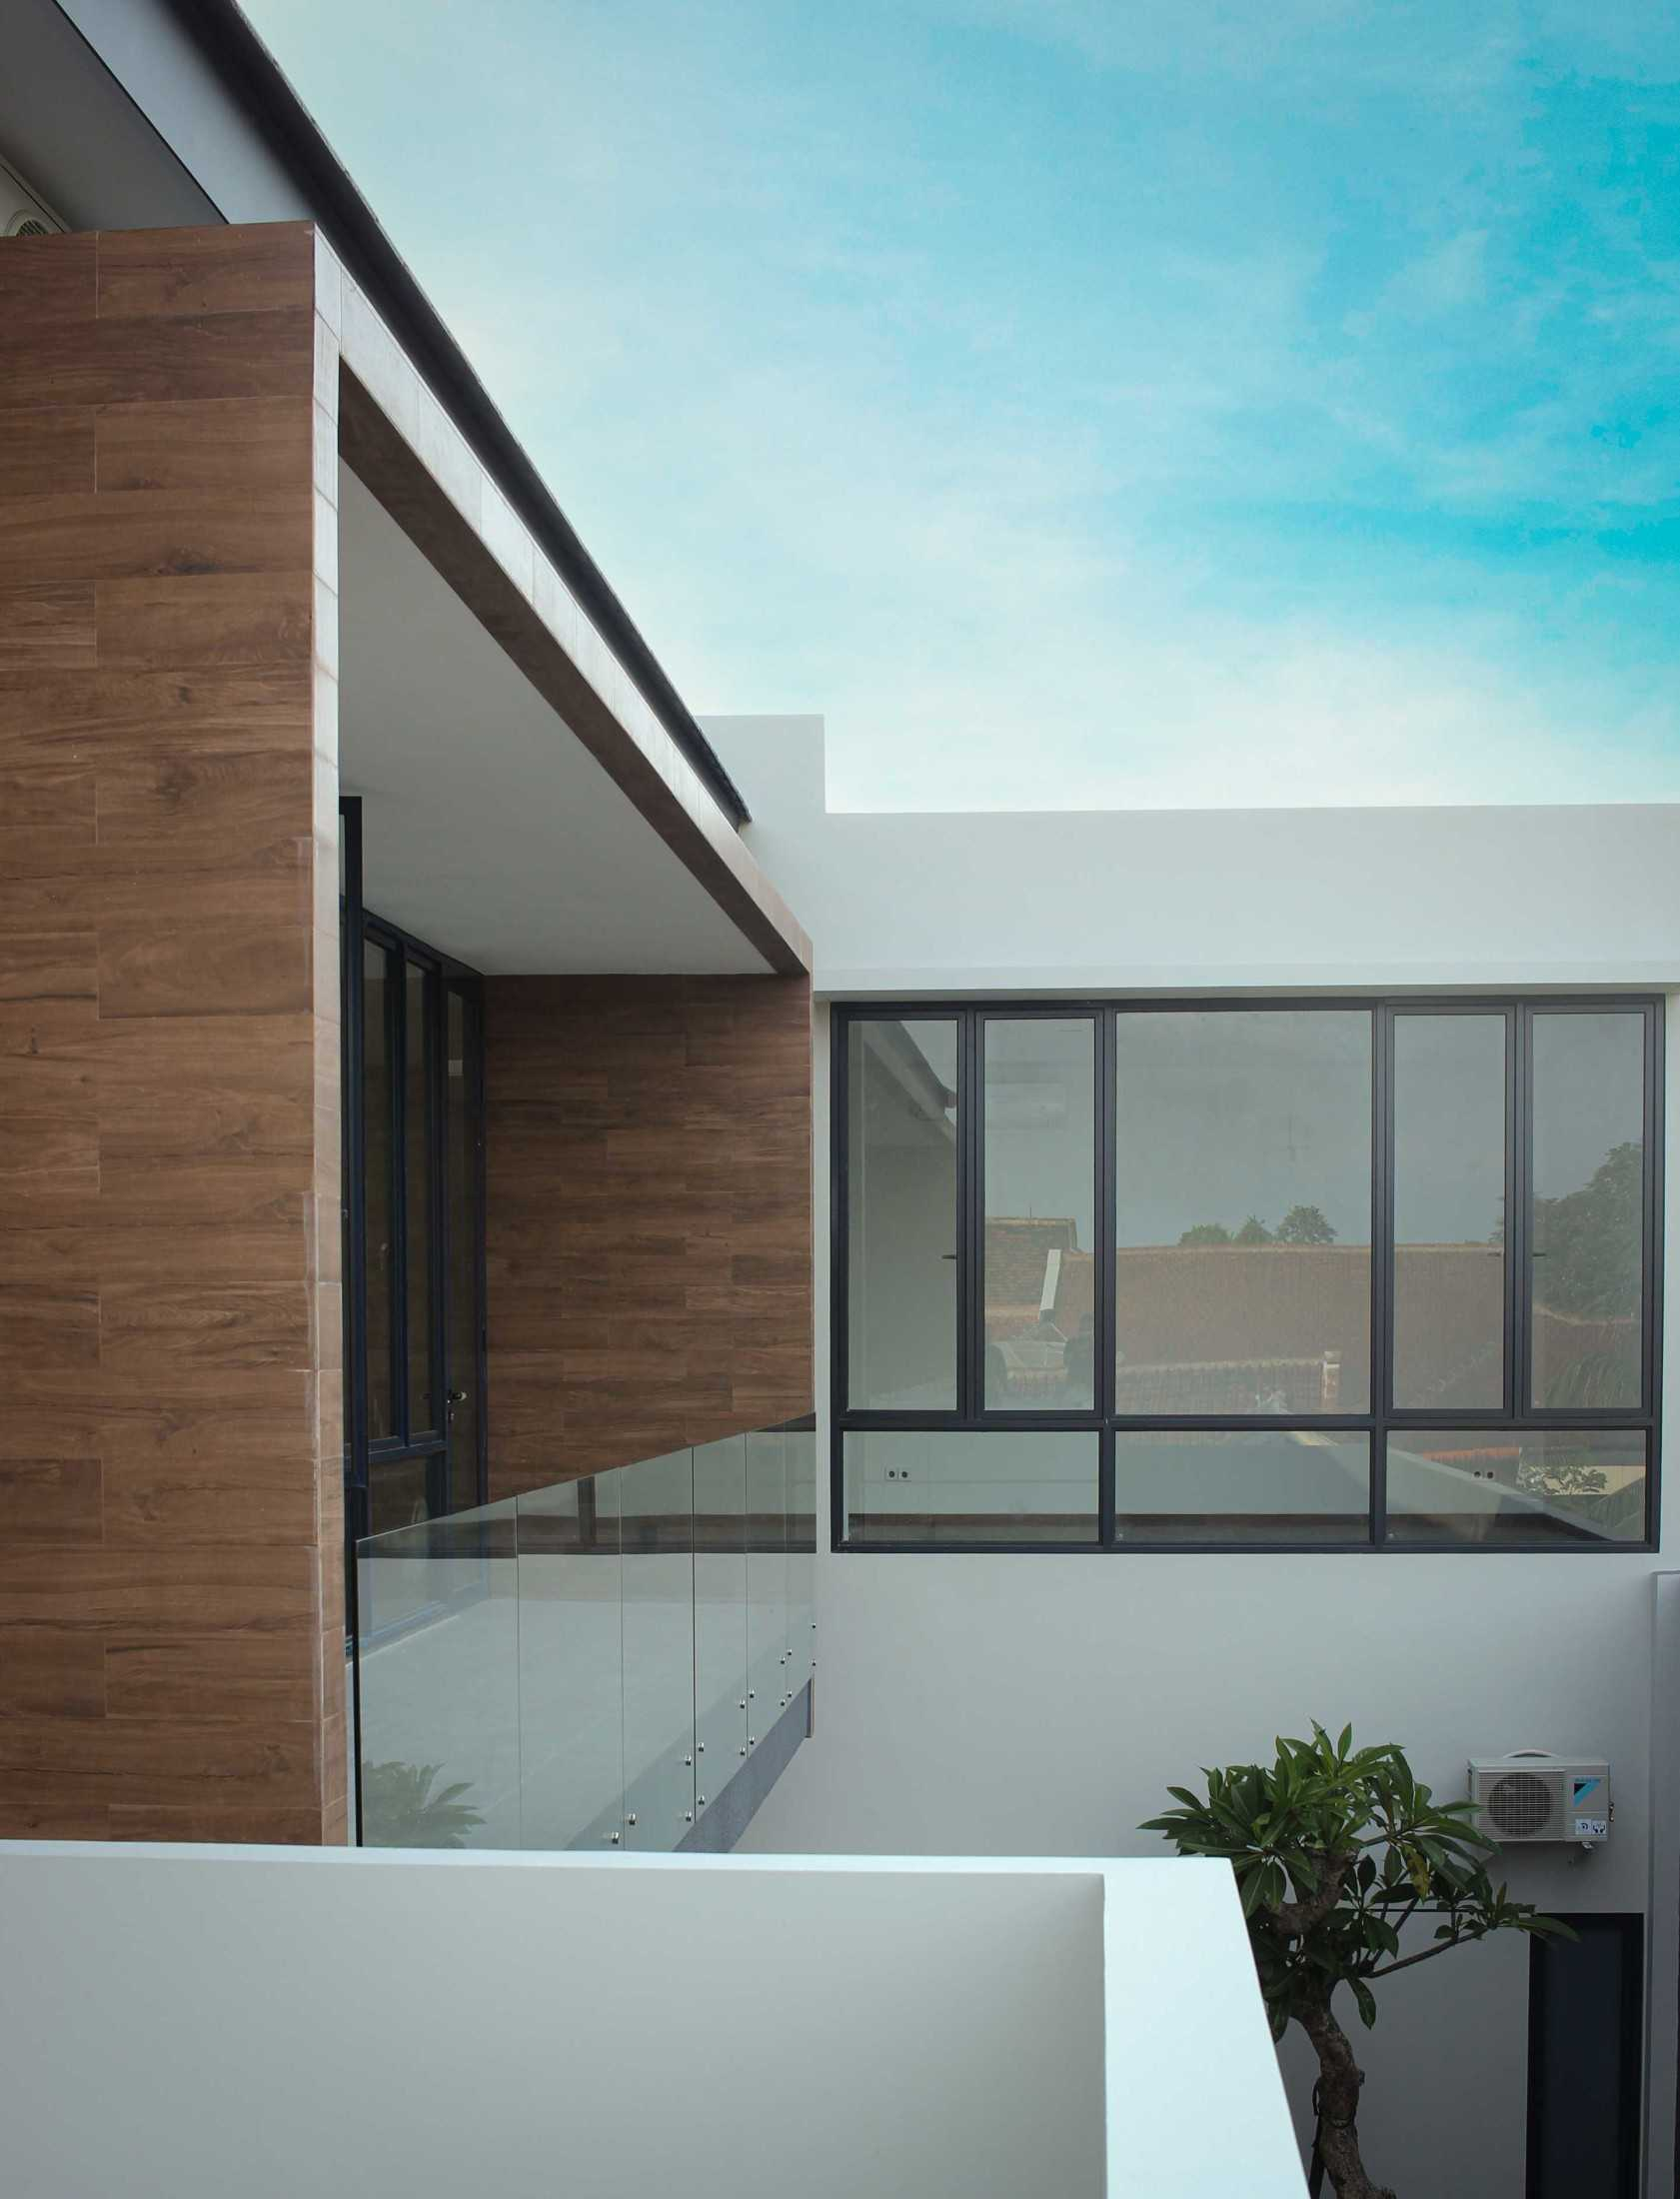 Y0 Design Architect S House Kec. Srono, Kabupaten Banyuwangi, Jawa Timur, Indonesia Kec. Srono, Kabupaten Banyuwangi, Jawa Timur, Indonesia Yohanes-Iswara-Limandjaya-S-House  121088